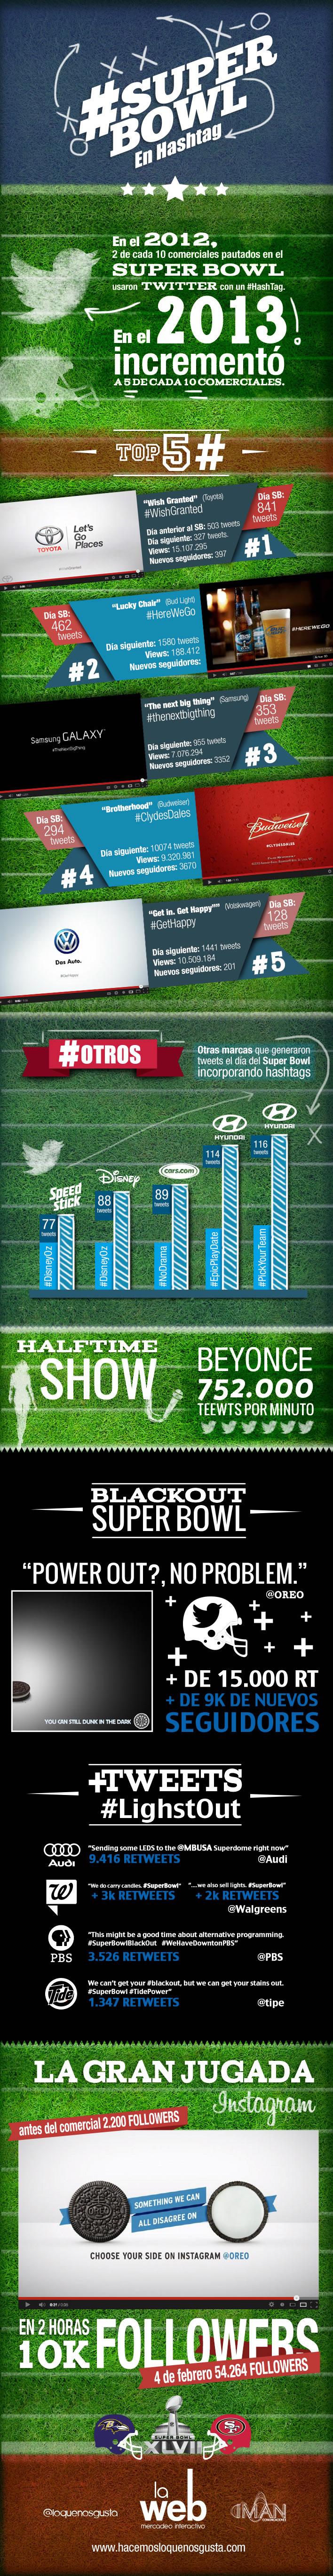 infography superbowl ravens baltimore